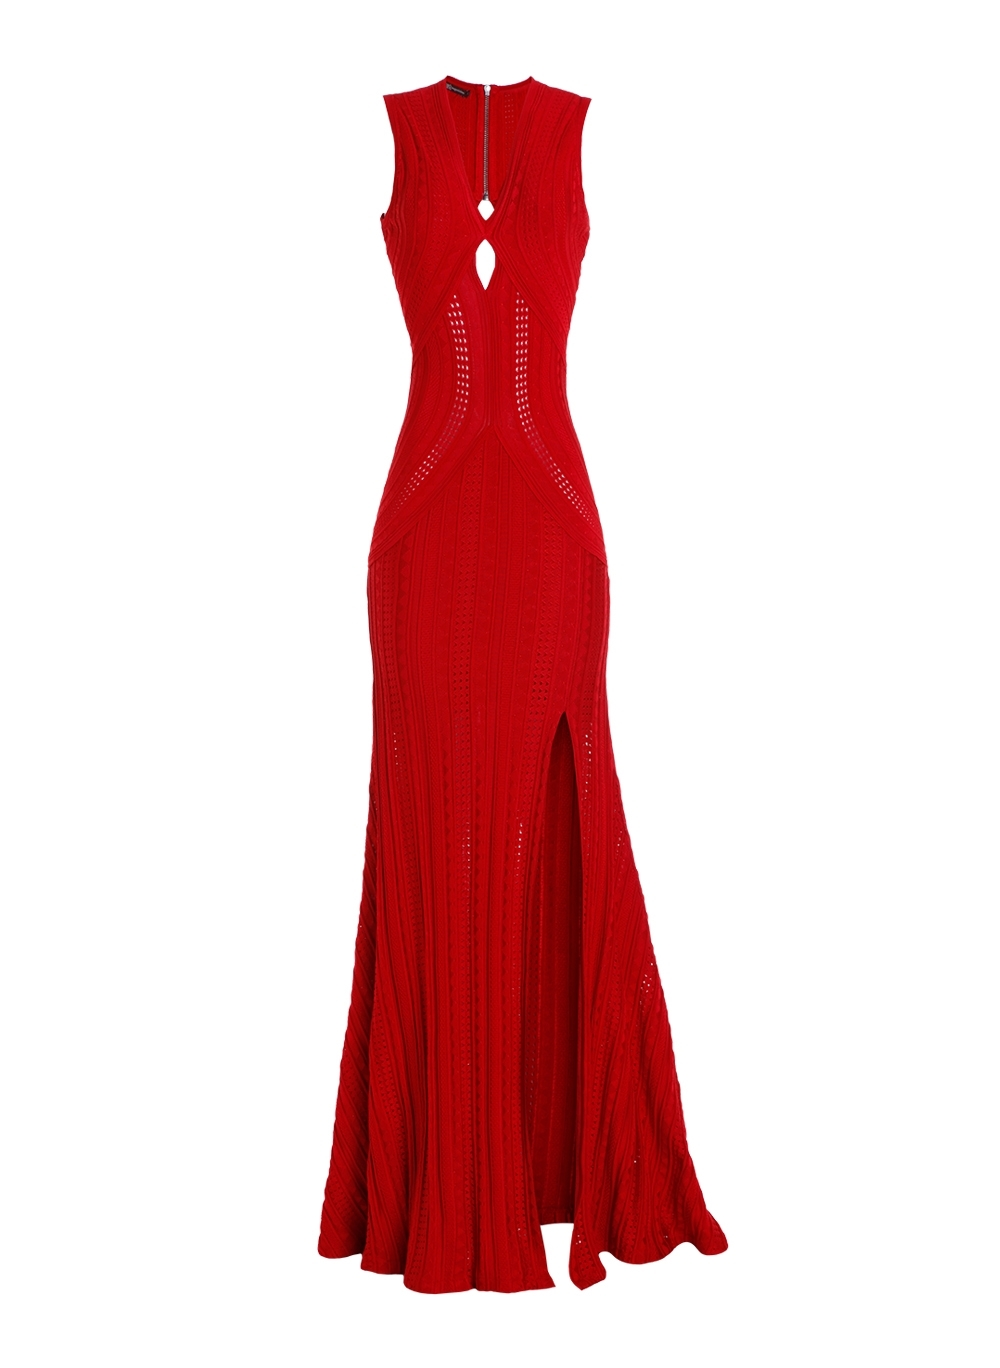 Vestido Bo.bô Longo Tricot Amanda Feminino (Vermelho Medio, M)